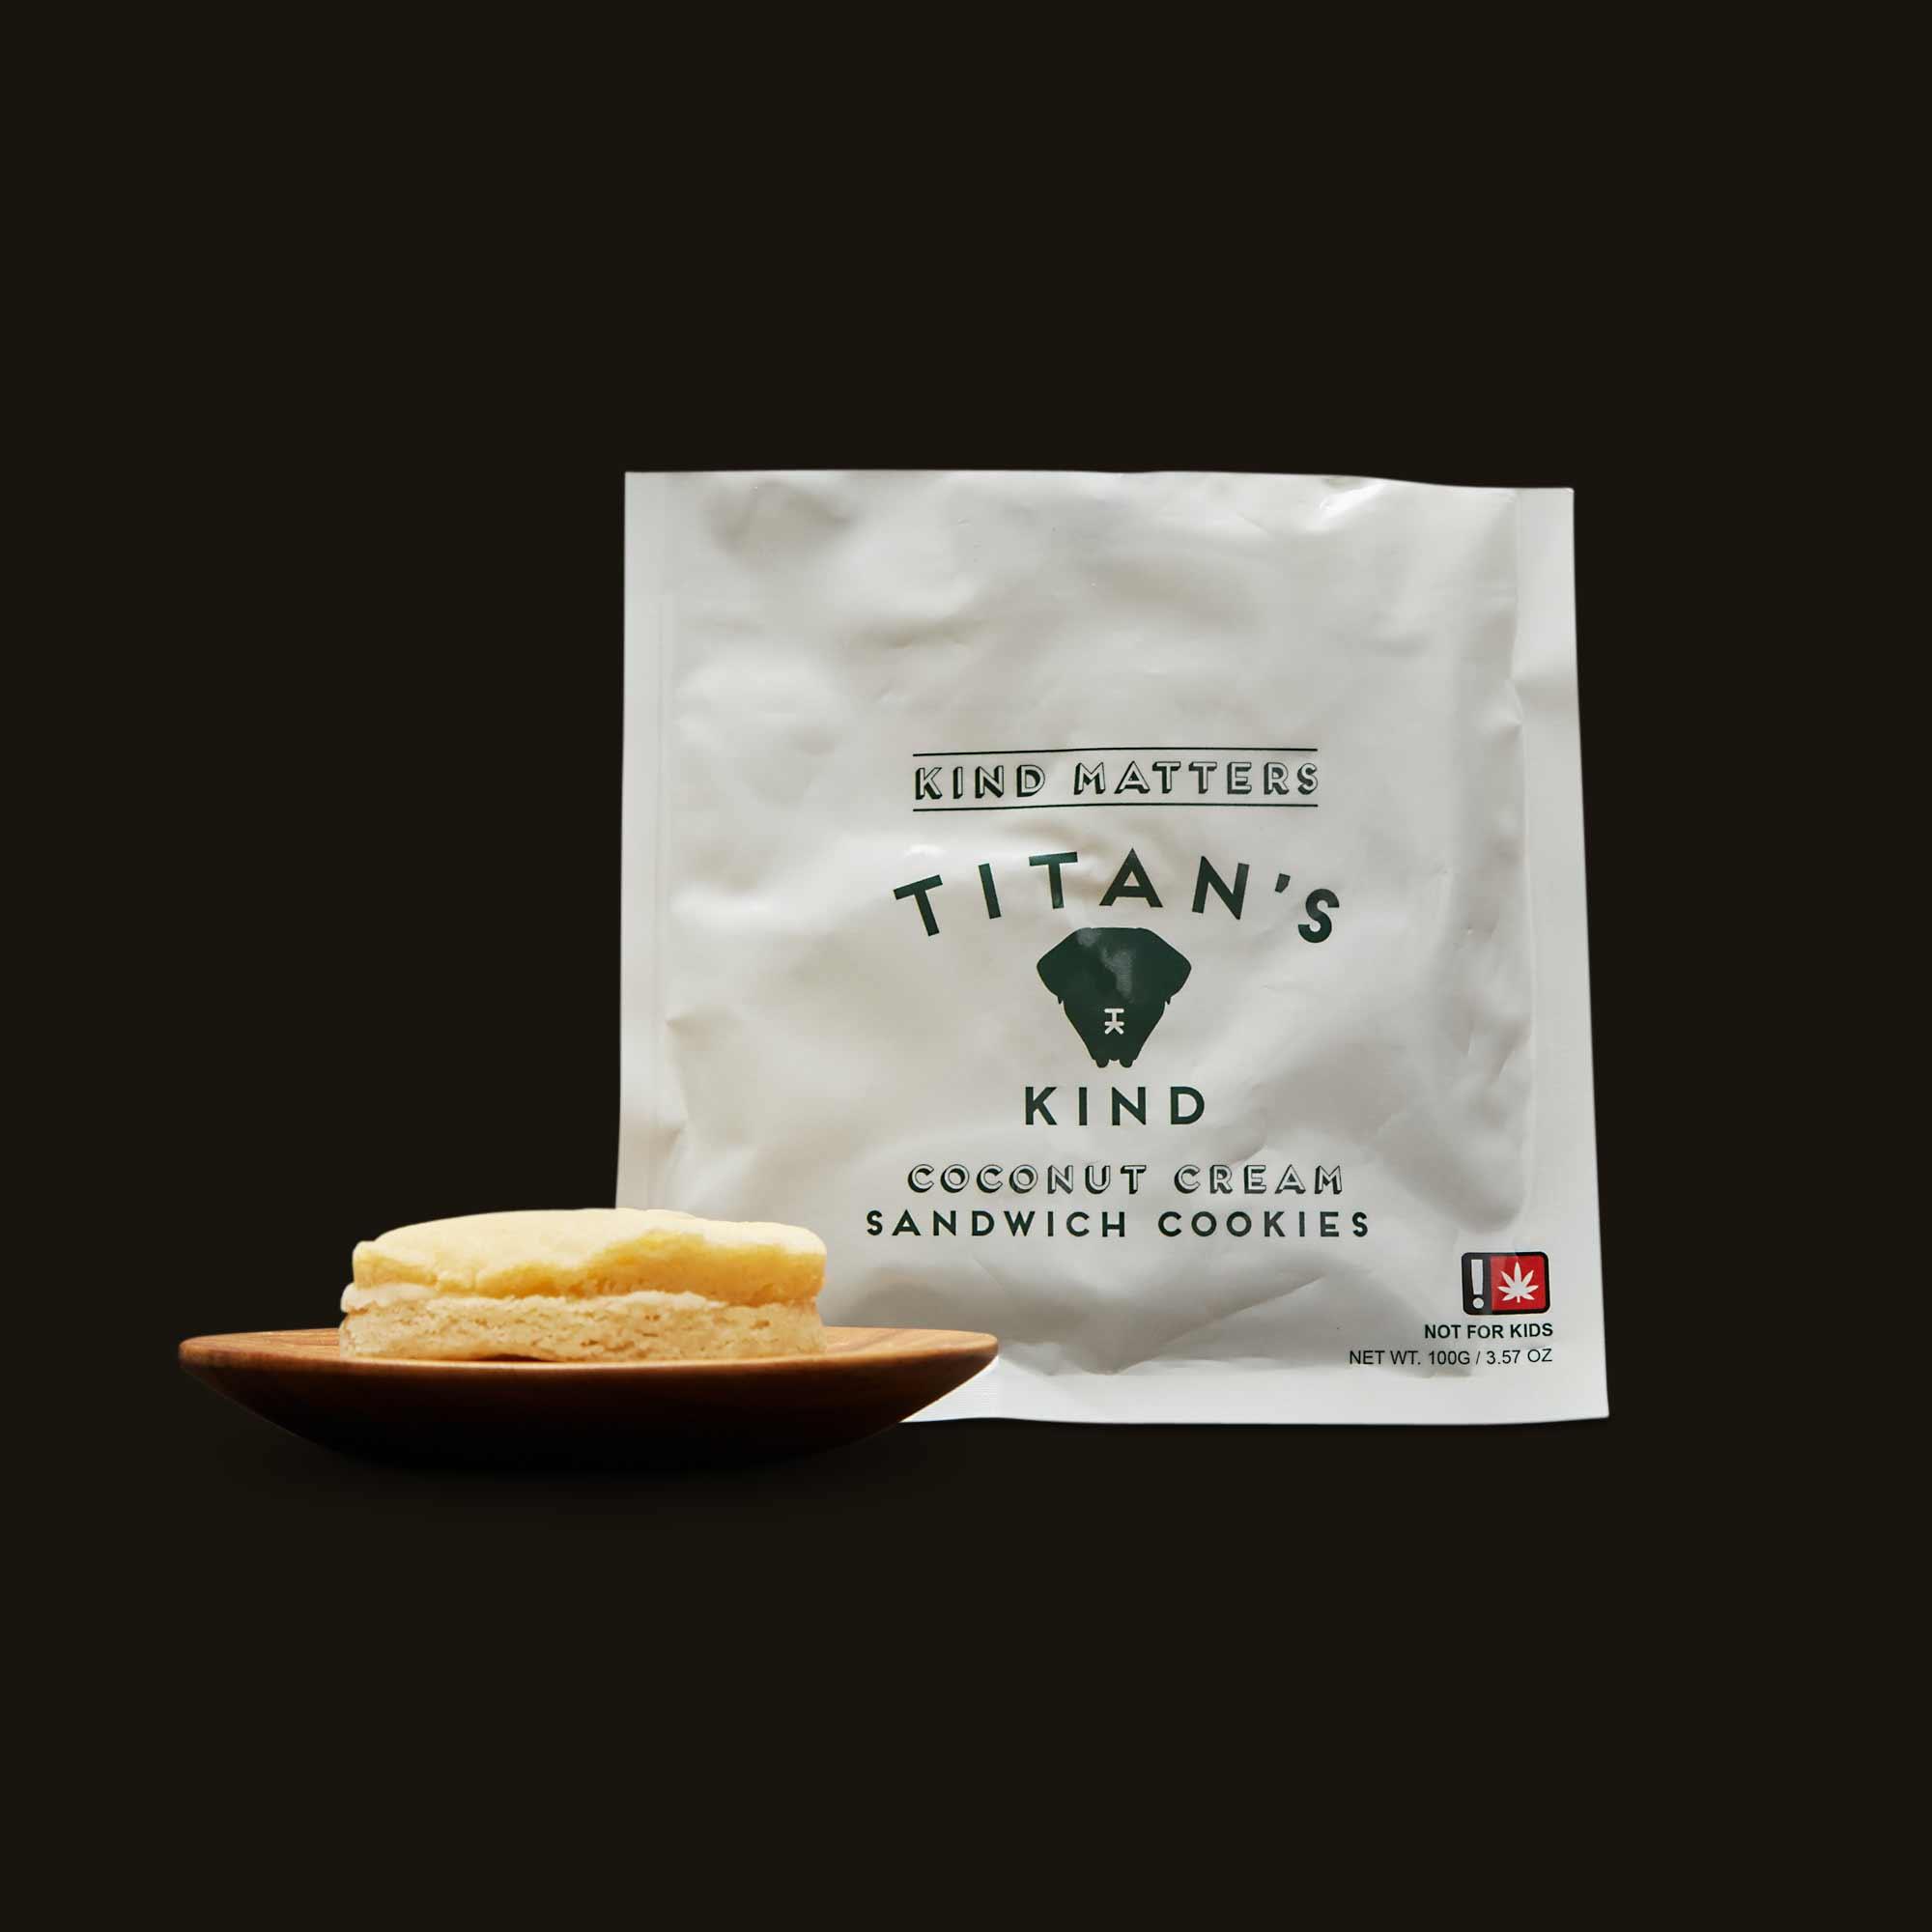 Titan's Kind Coconut Cream Sandwich Cookies